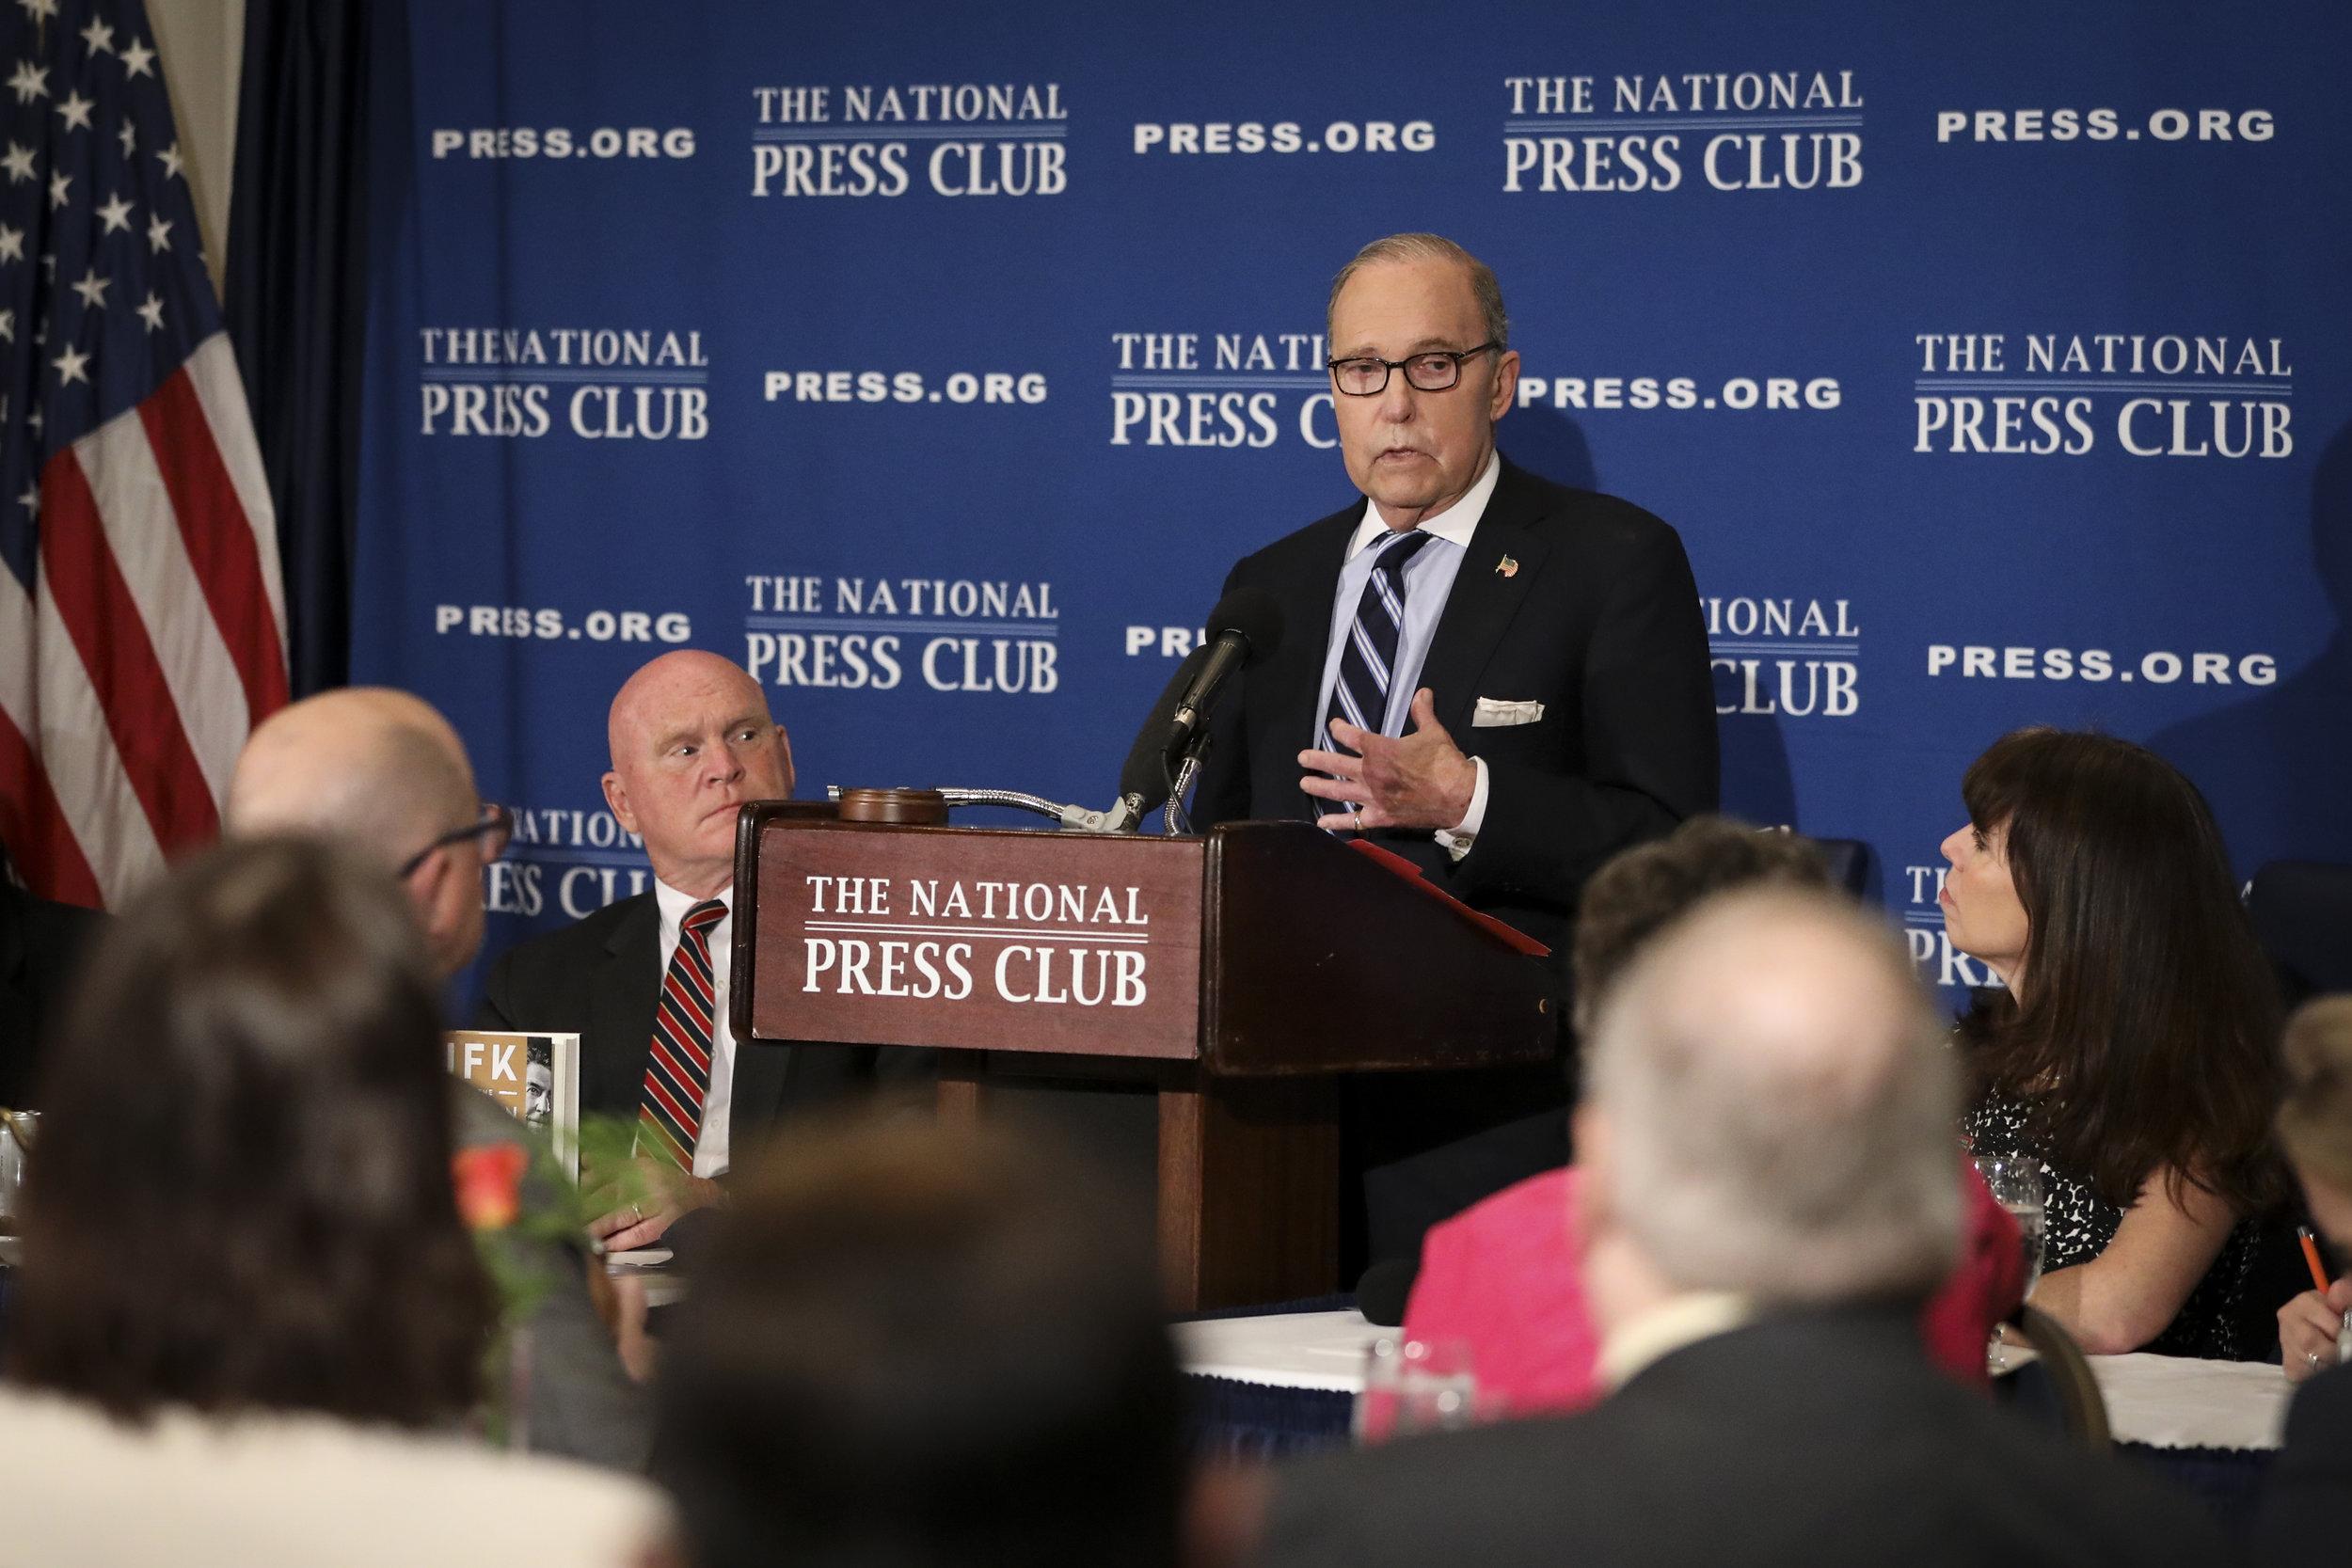 Larry Kudlow addressed the National Press Club in Washington on April 23, 2019. (Samira Bouaou/The Epoch Times) 库德洛2019年4月23日在美國國家記者部就美國經濟發表演講。(攝影:英文大紀元攝影師Samira Bouaou)